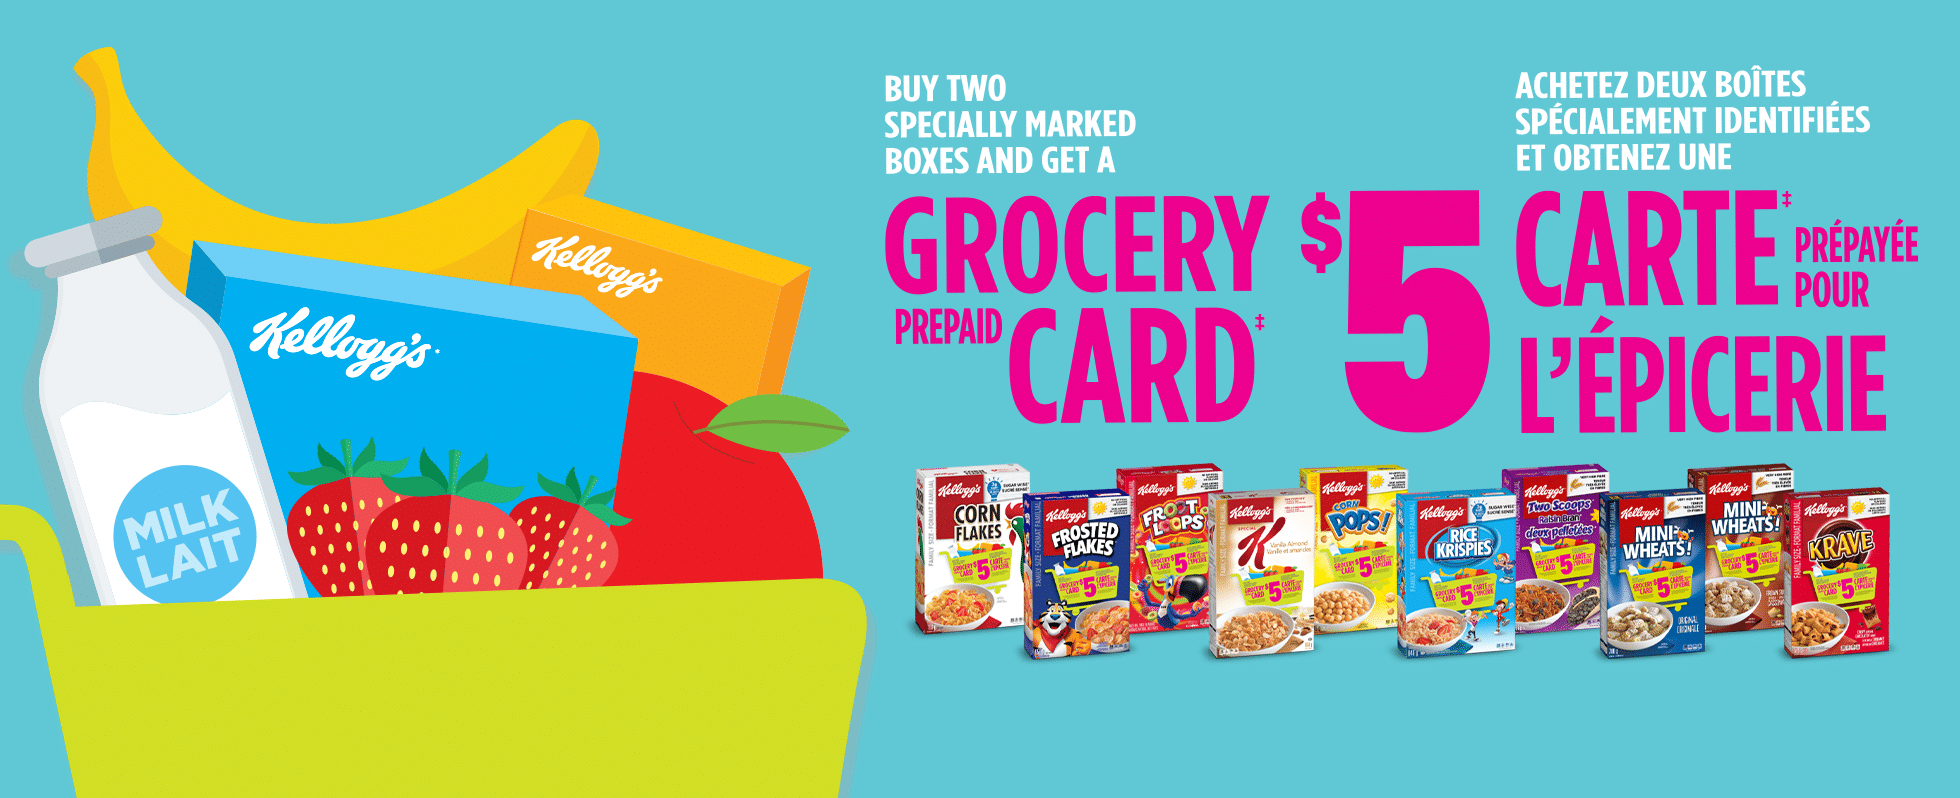 free prepaid grocery gift card kelloggs